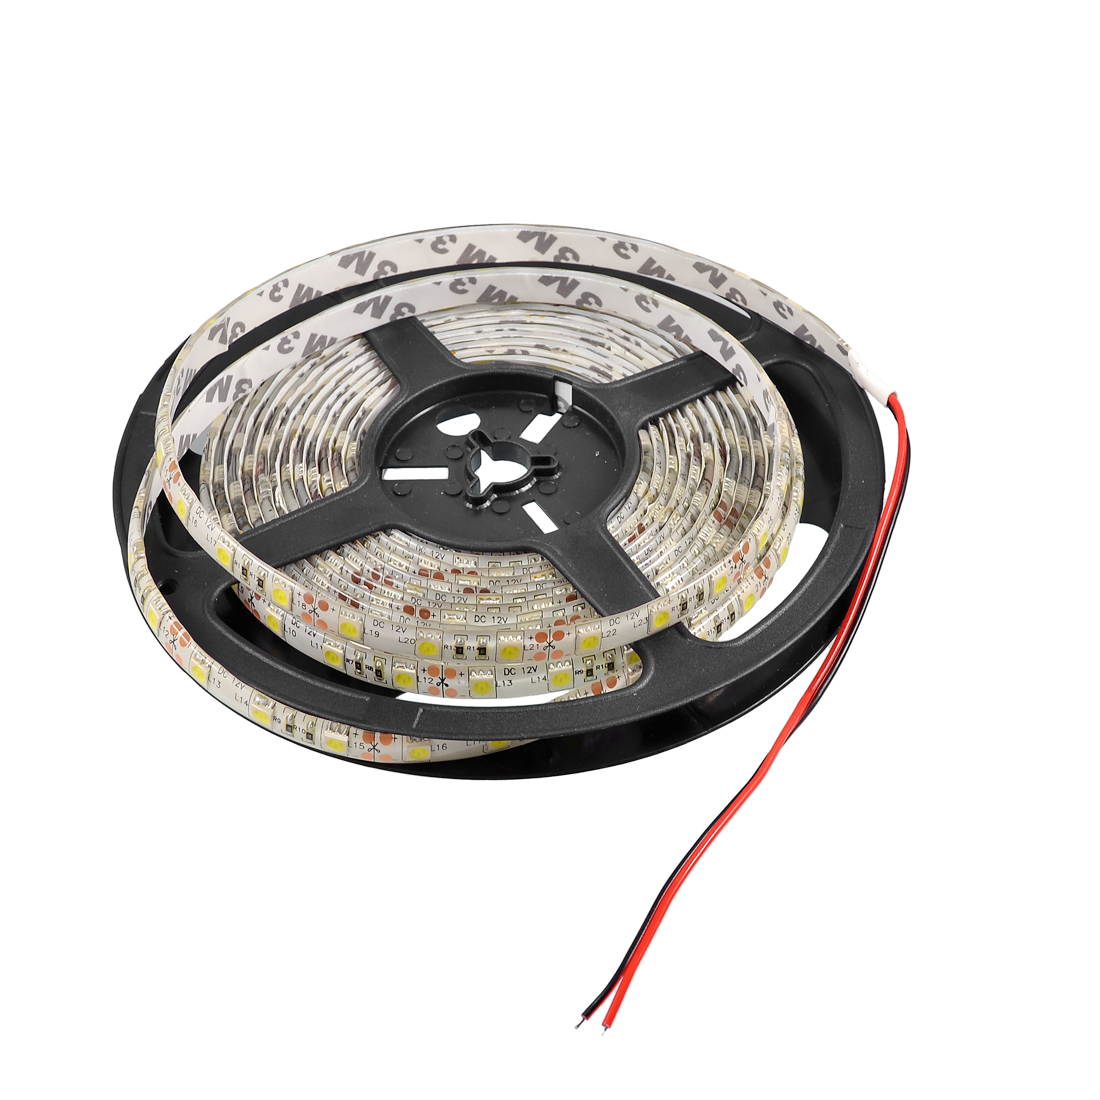 Car Auto Decorative 5M 5050 Cool White 300 SMD LED Flexible Light internal